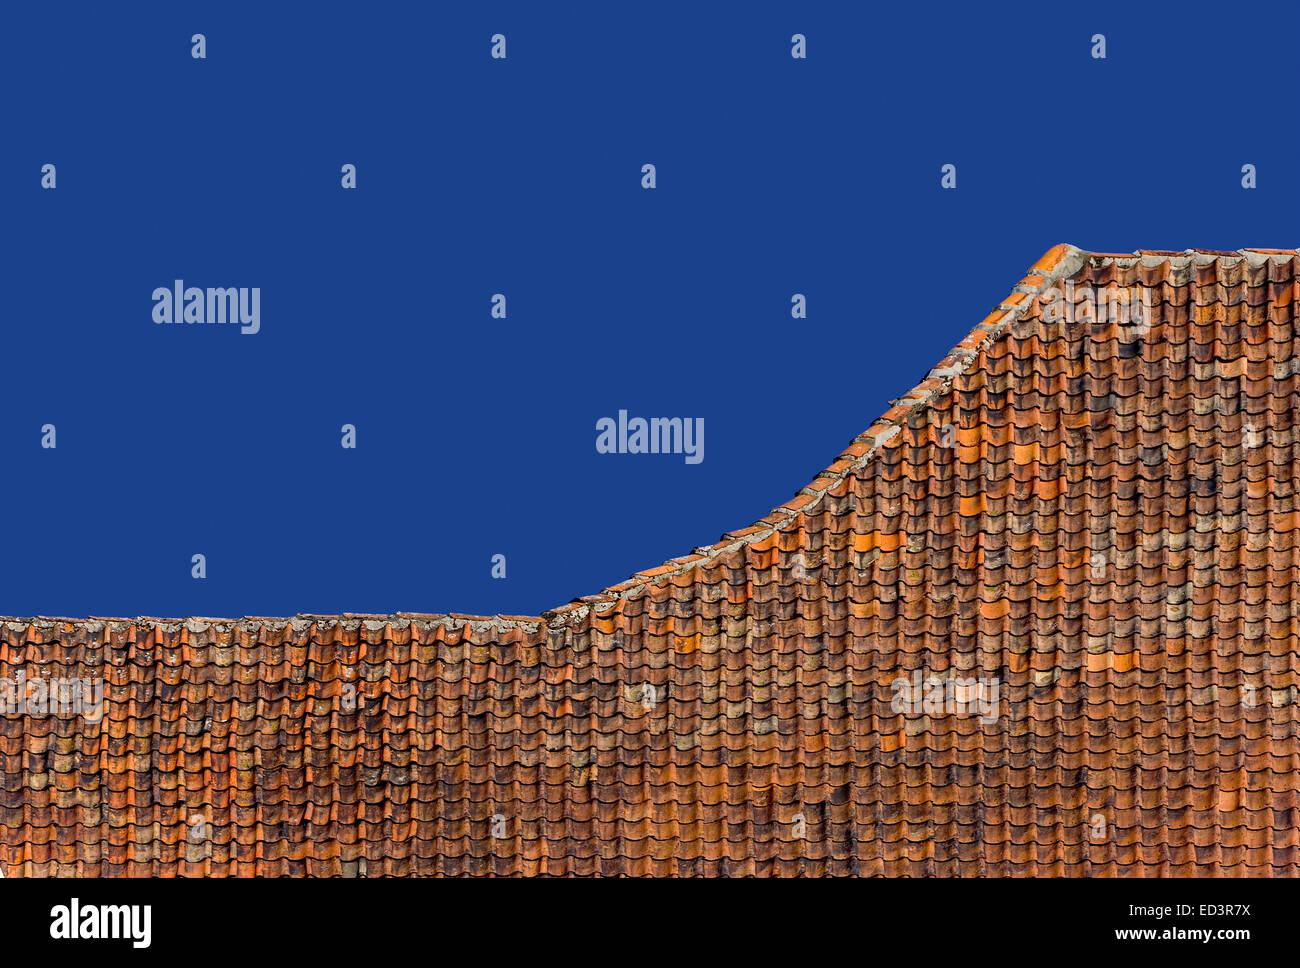 roof ridge tiles stockfotos roof ridge tiles bilder alamy. Black Bedroom Furniture Sets. Home Design Ideas